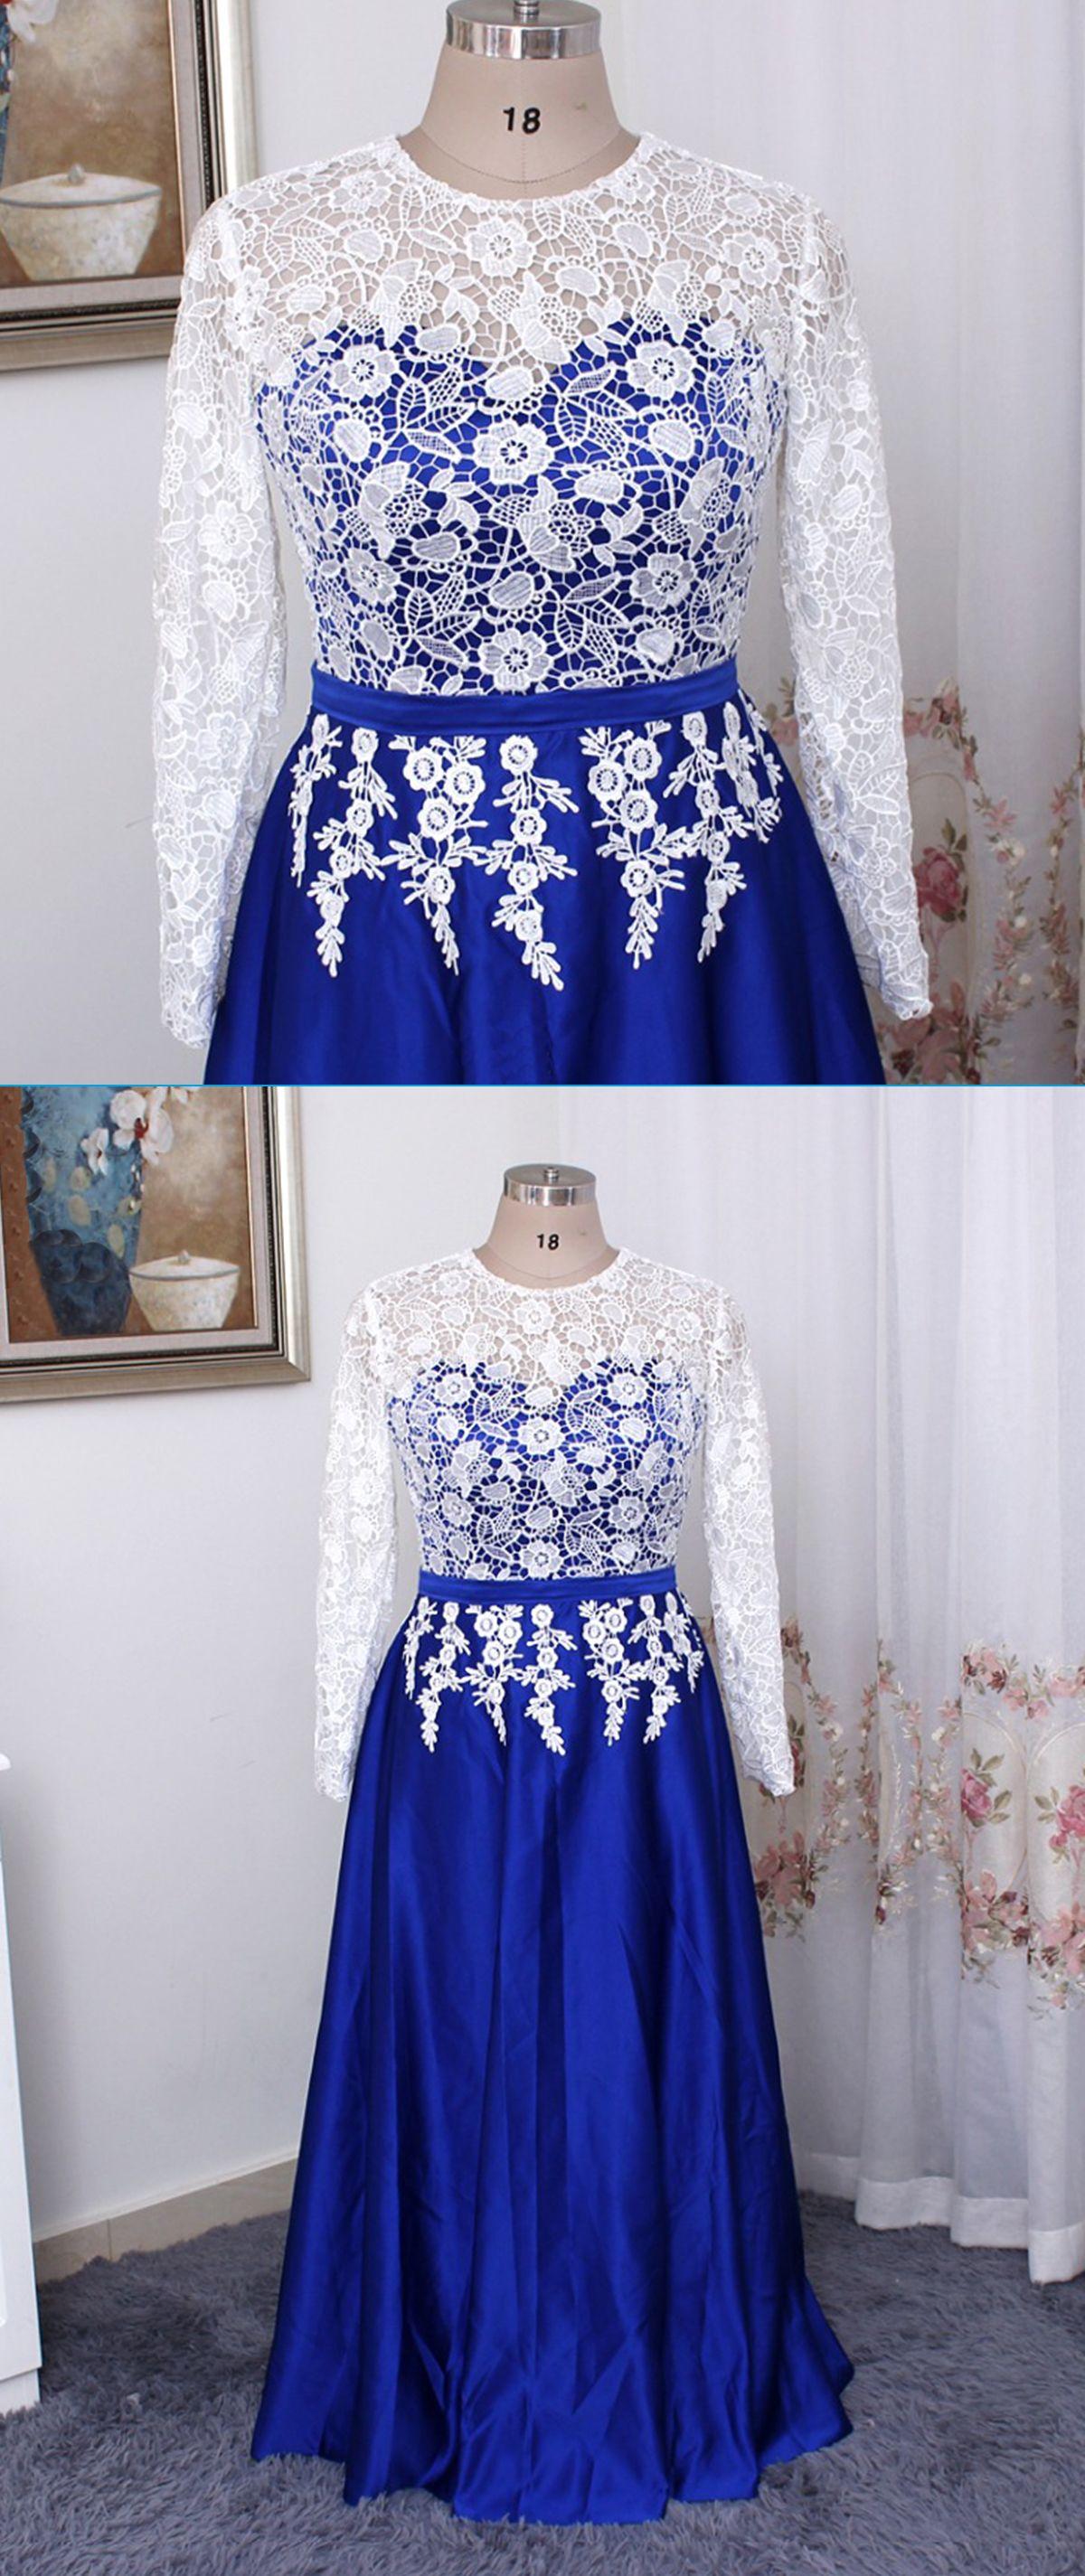 Royal blue satin long white lace plus size prom dress long sleeve